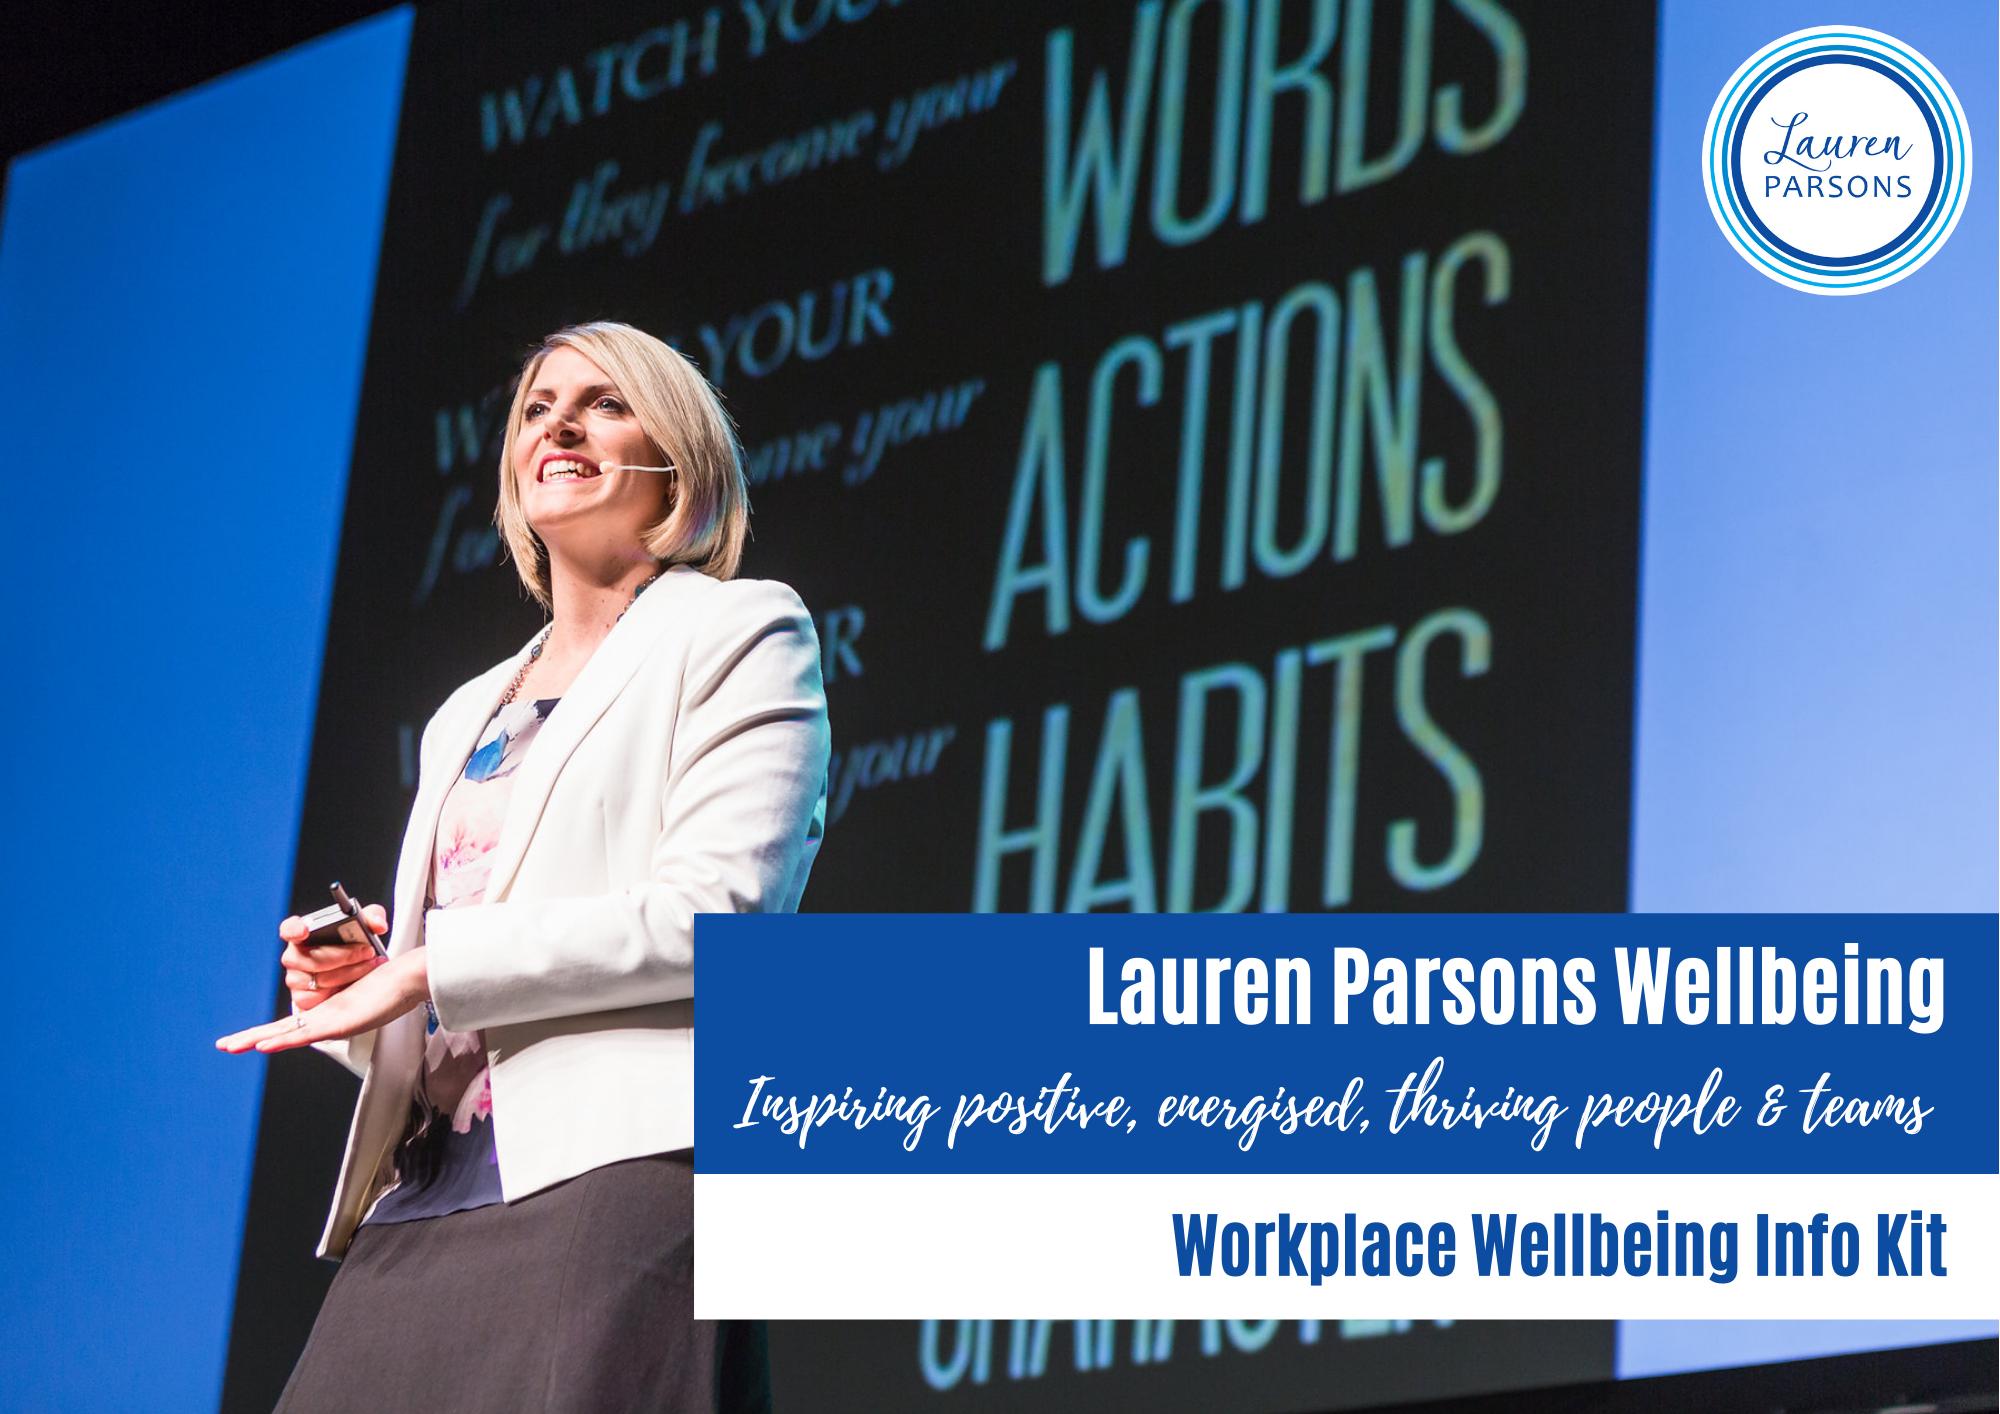 Lauren Parsons Wellbeing Specialist Speaker and Author Speakers Kit